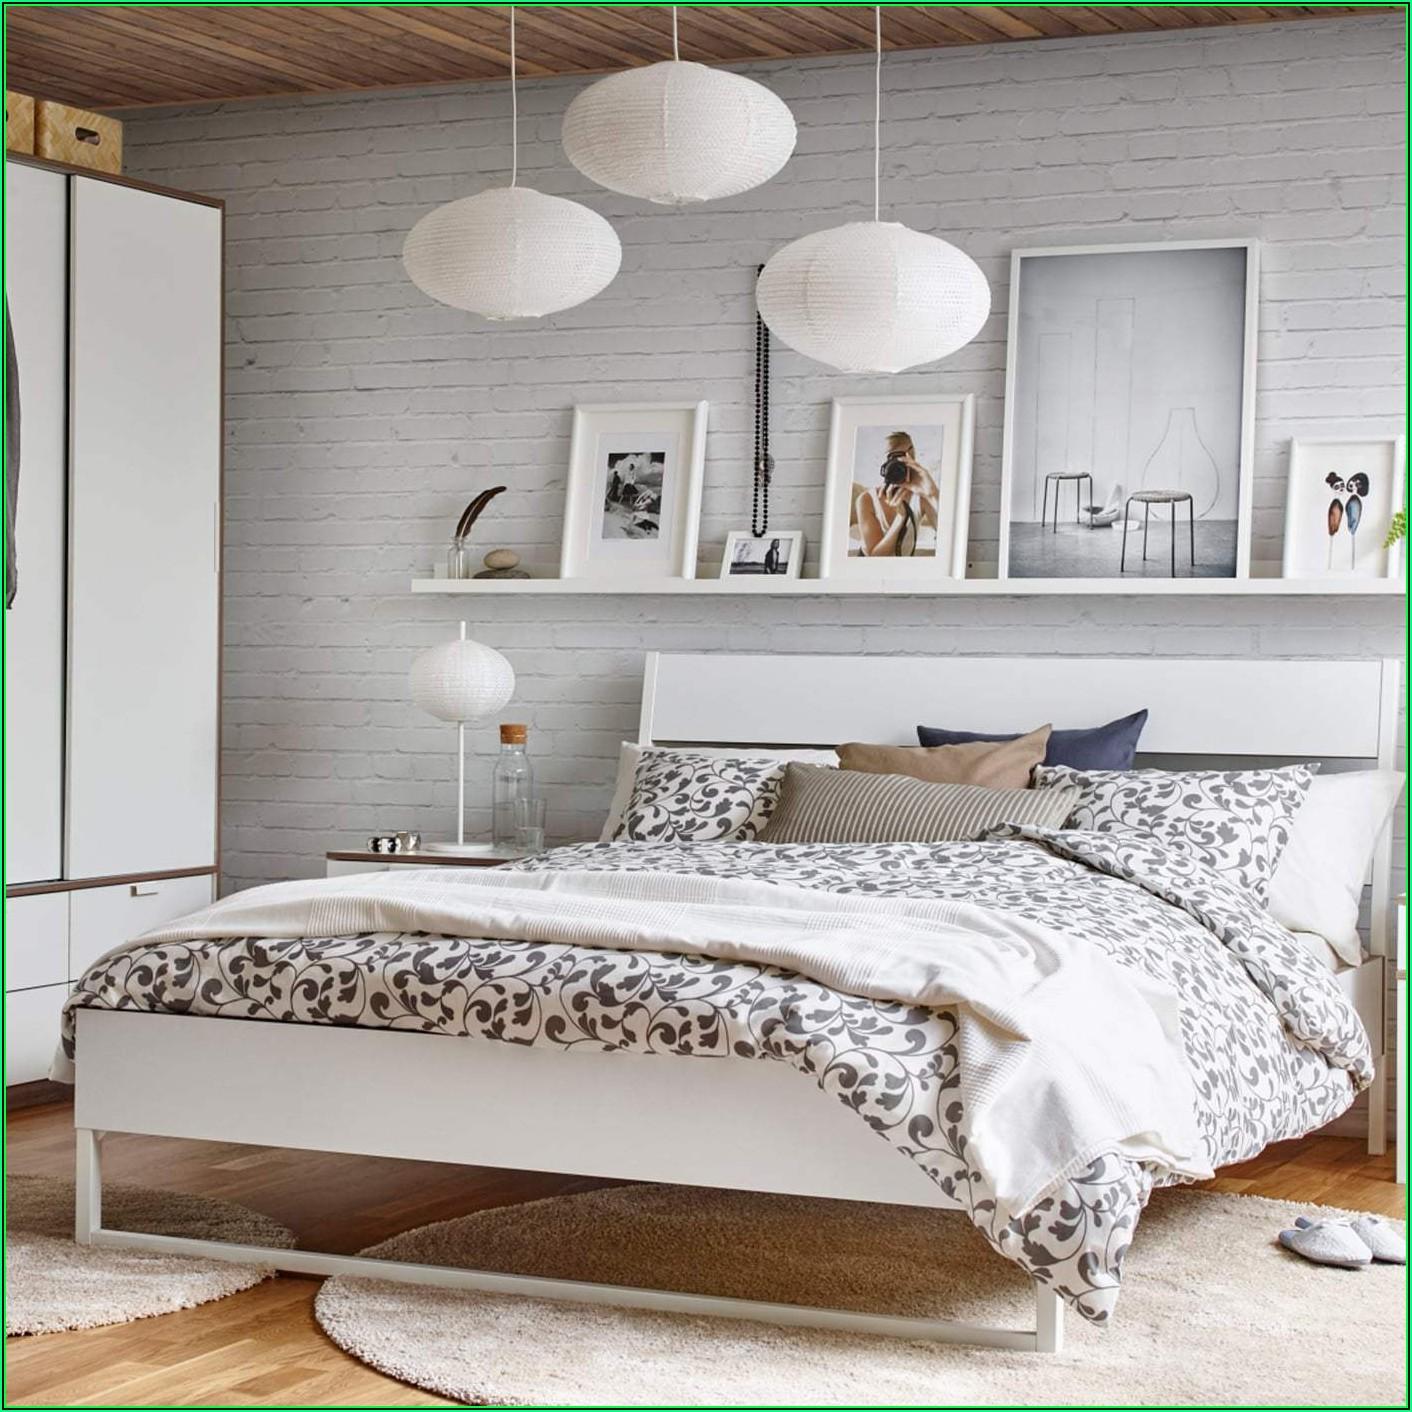 Ikea Schlafzimmer Rustikal